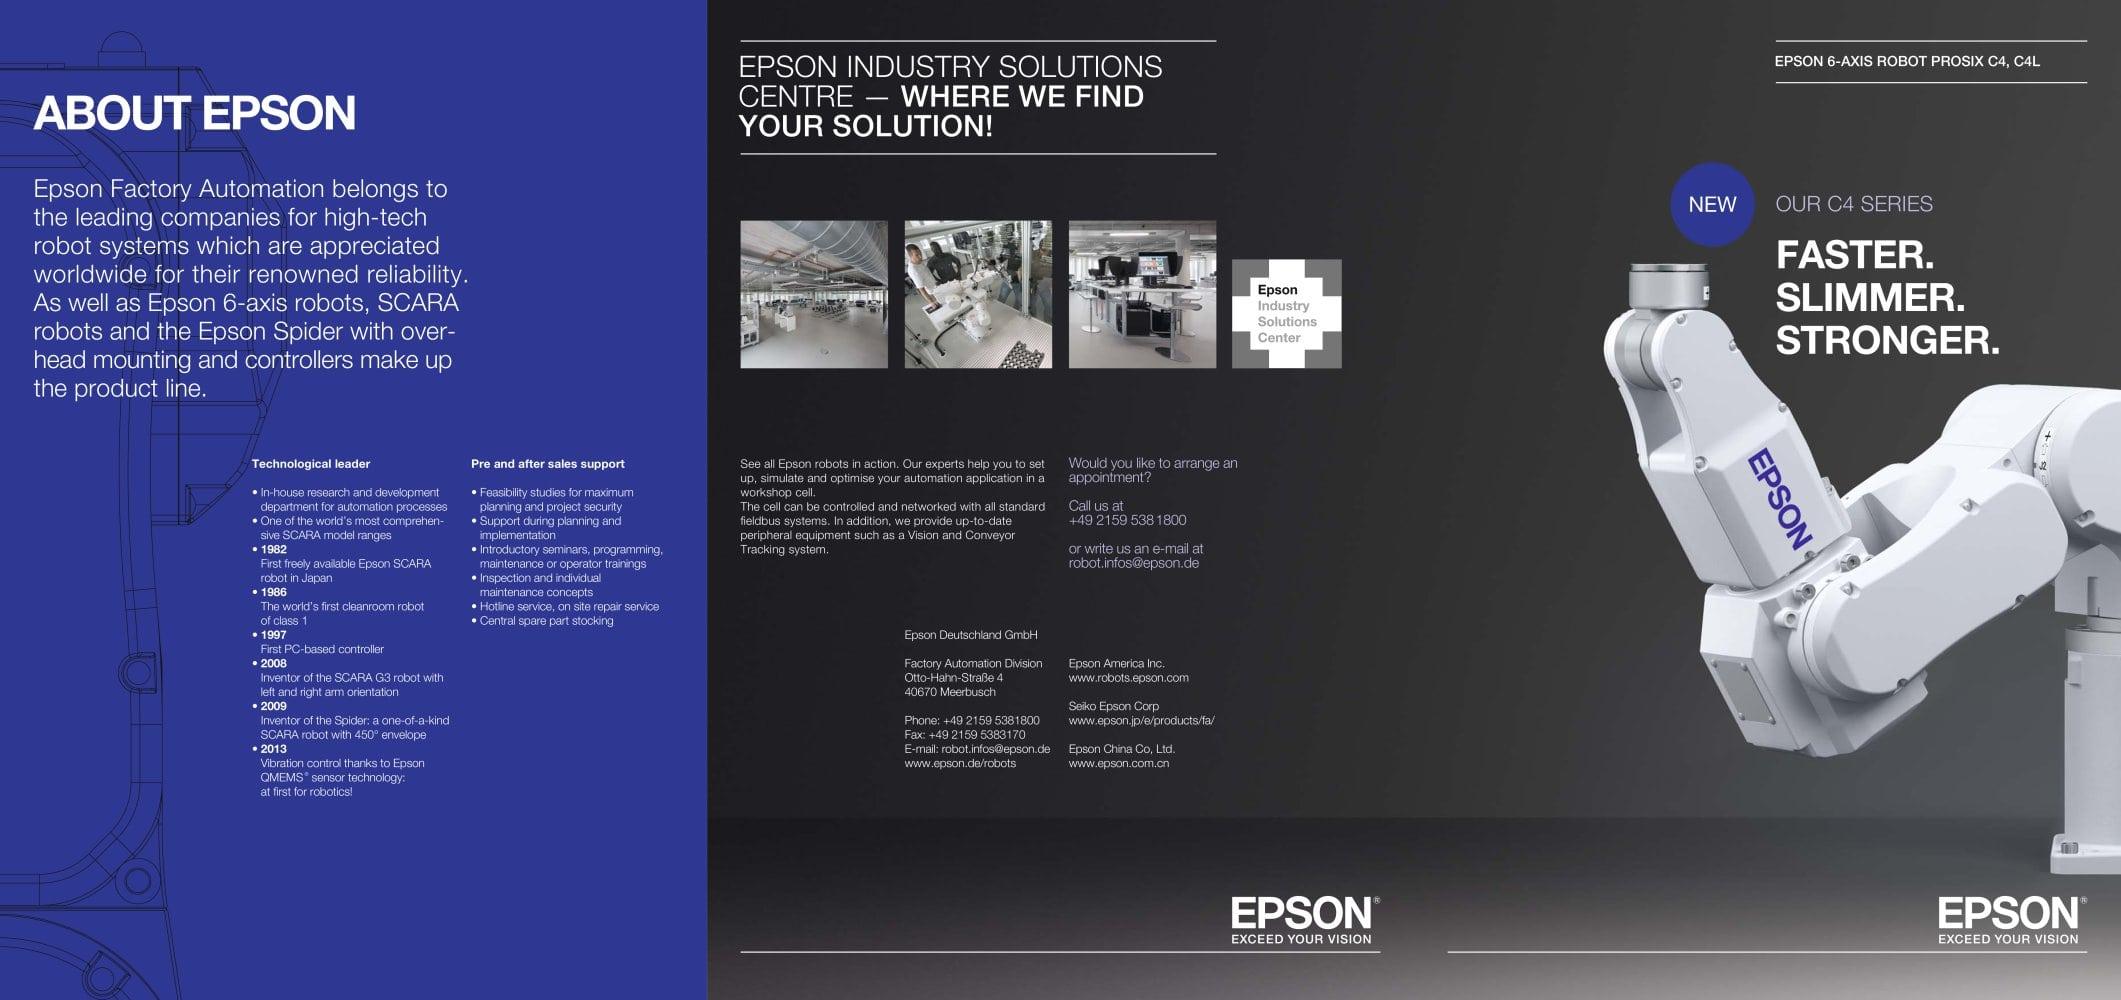 Epson Prosix C4 Epson Robotic Solutions Pdf Catalogs Technical